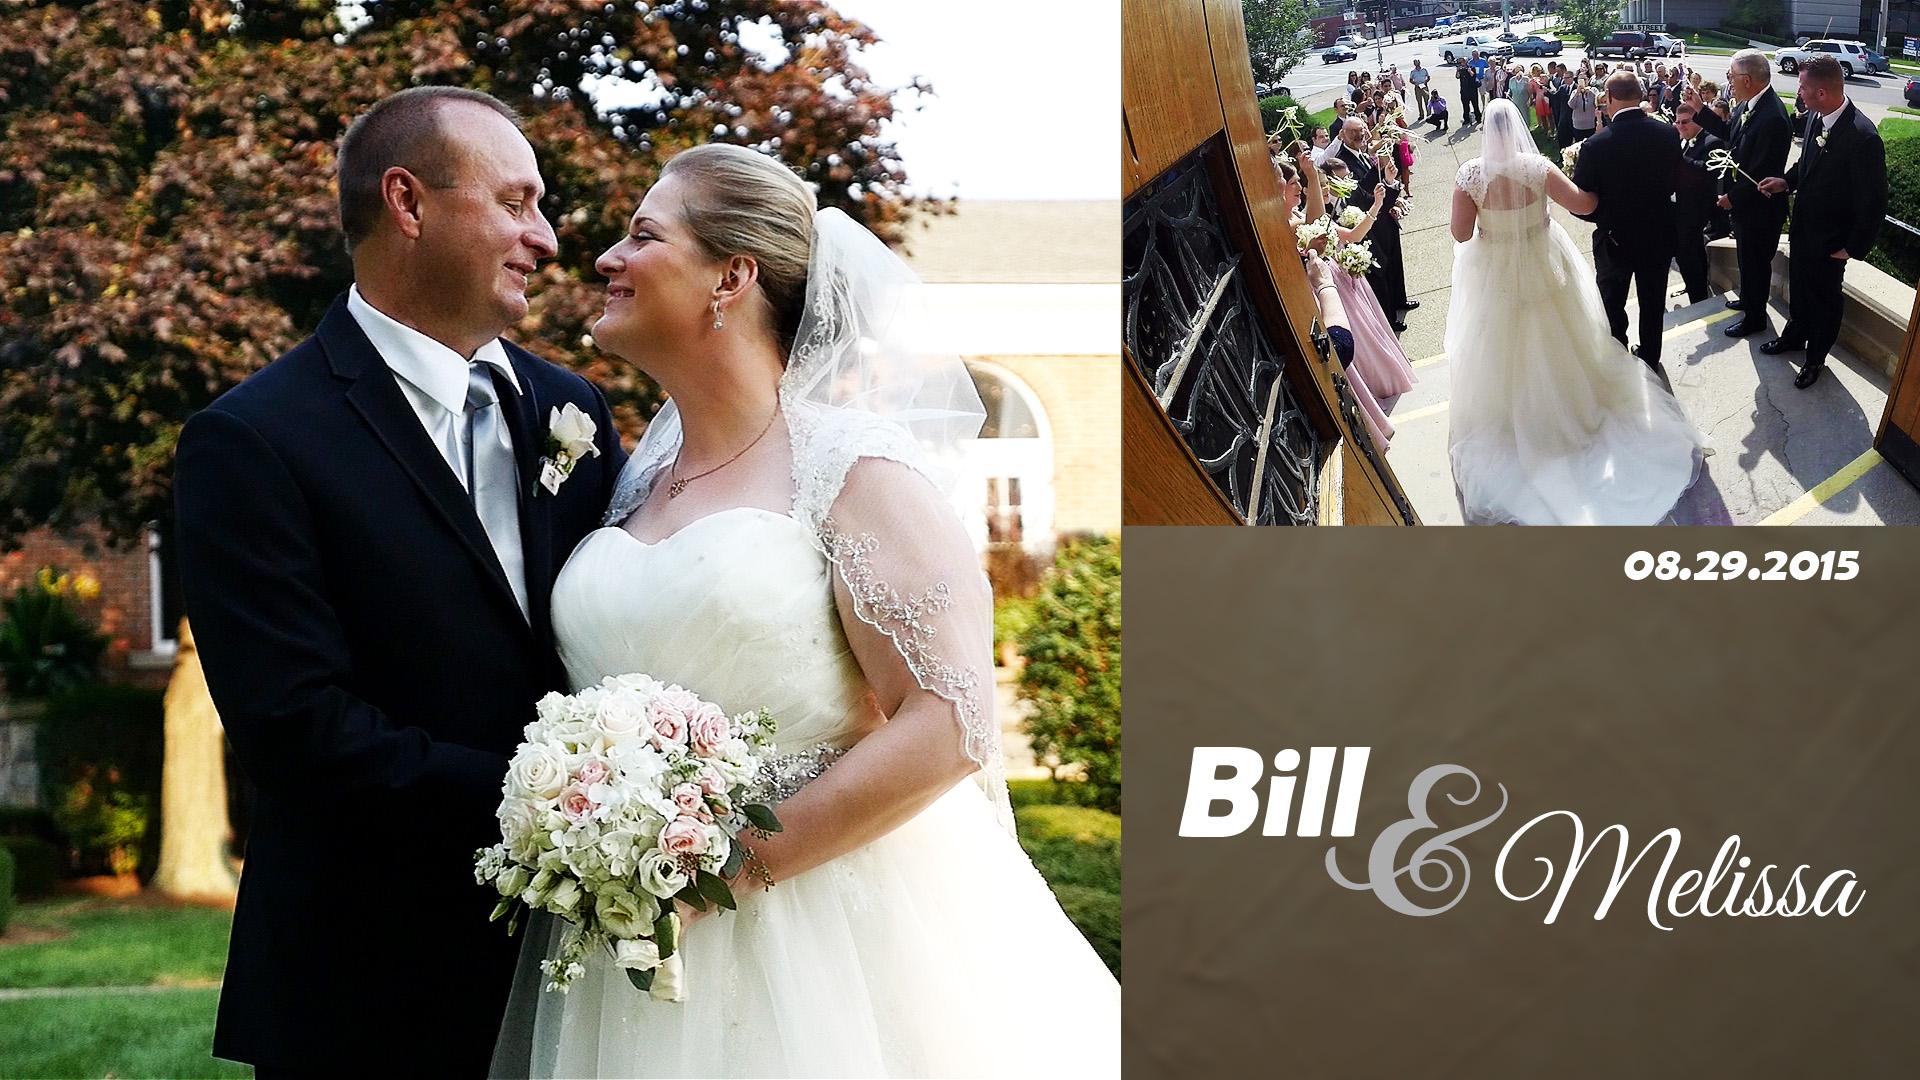 Bill & Melissa – Buffalo Wedding Video